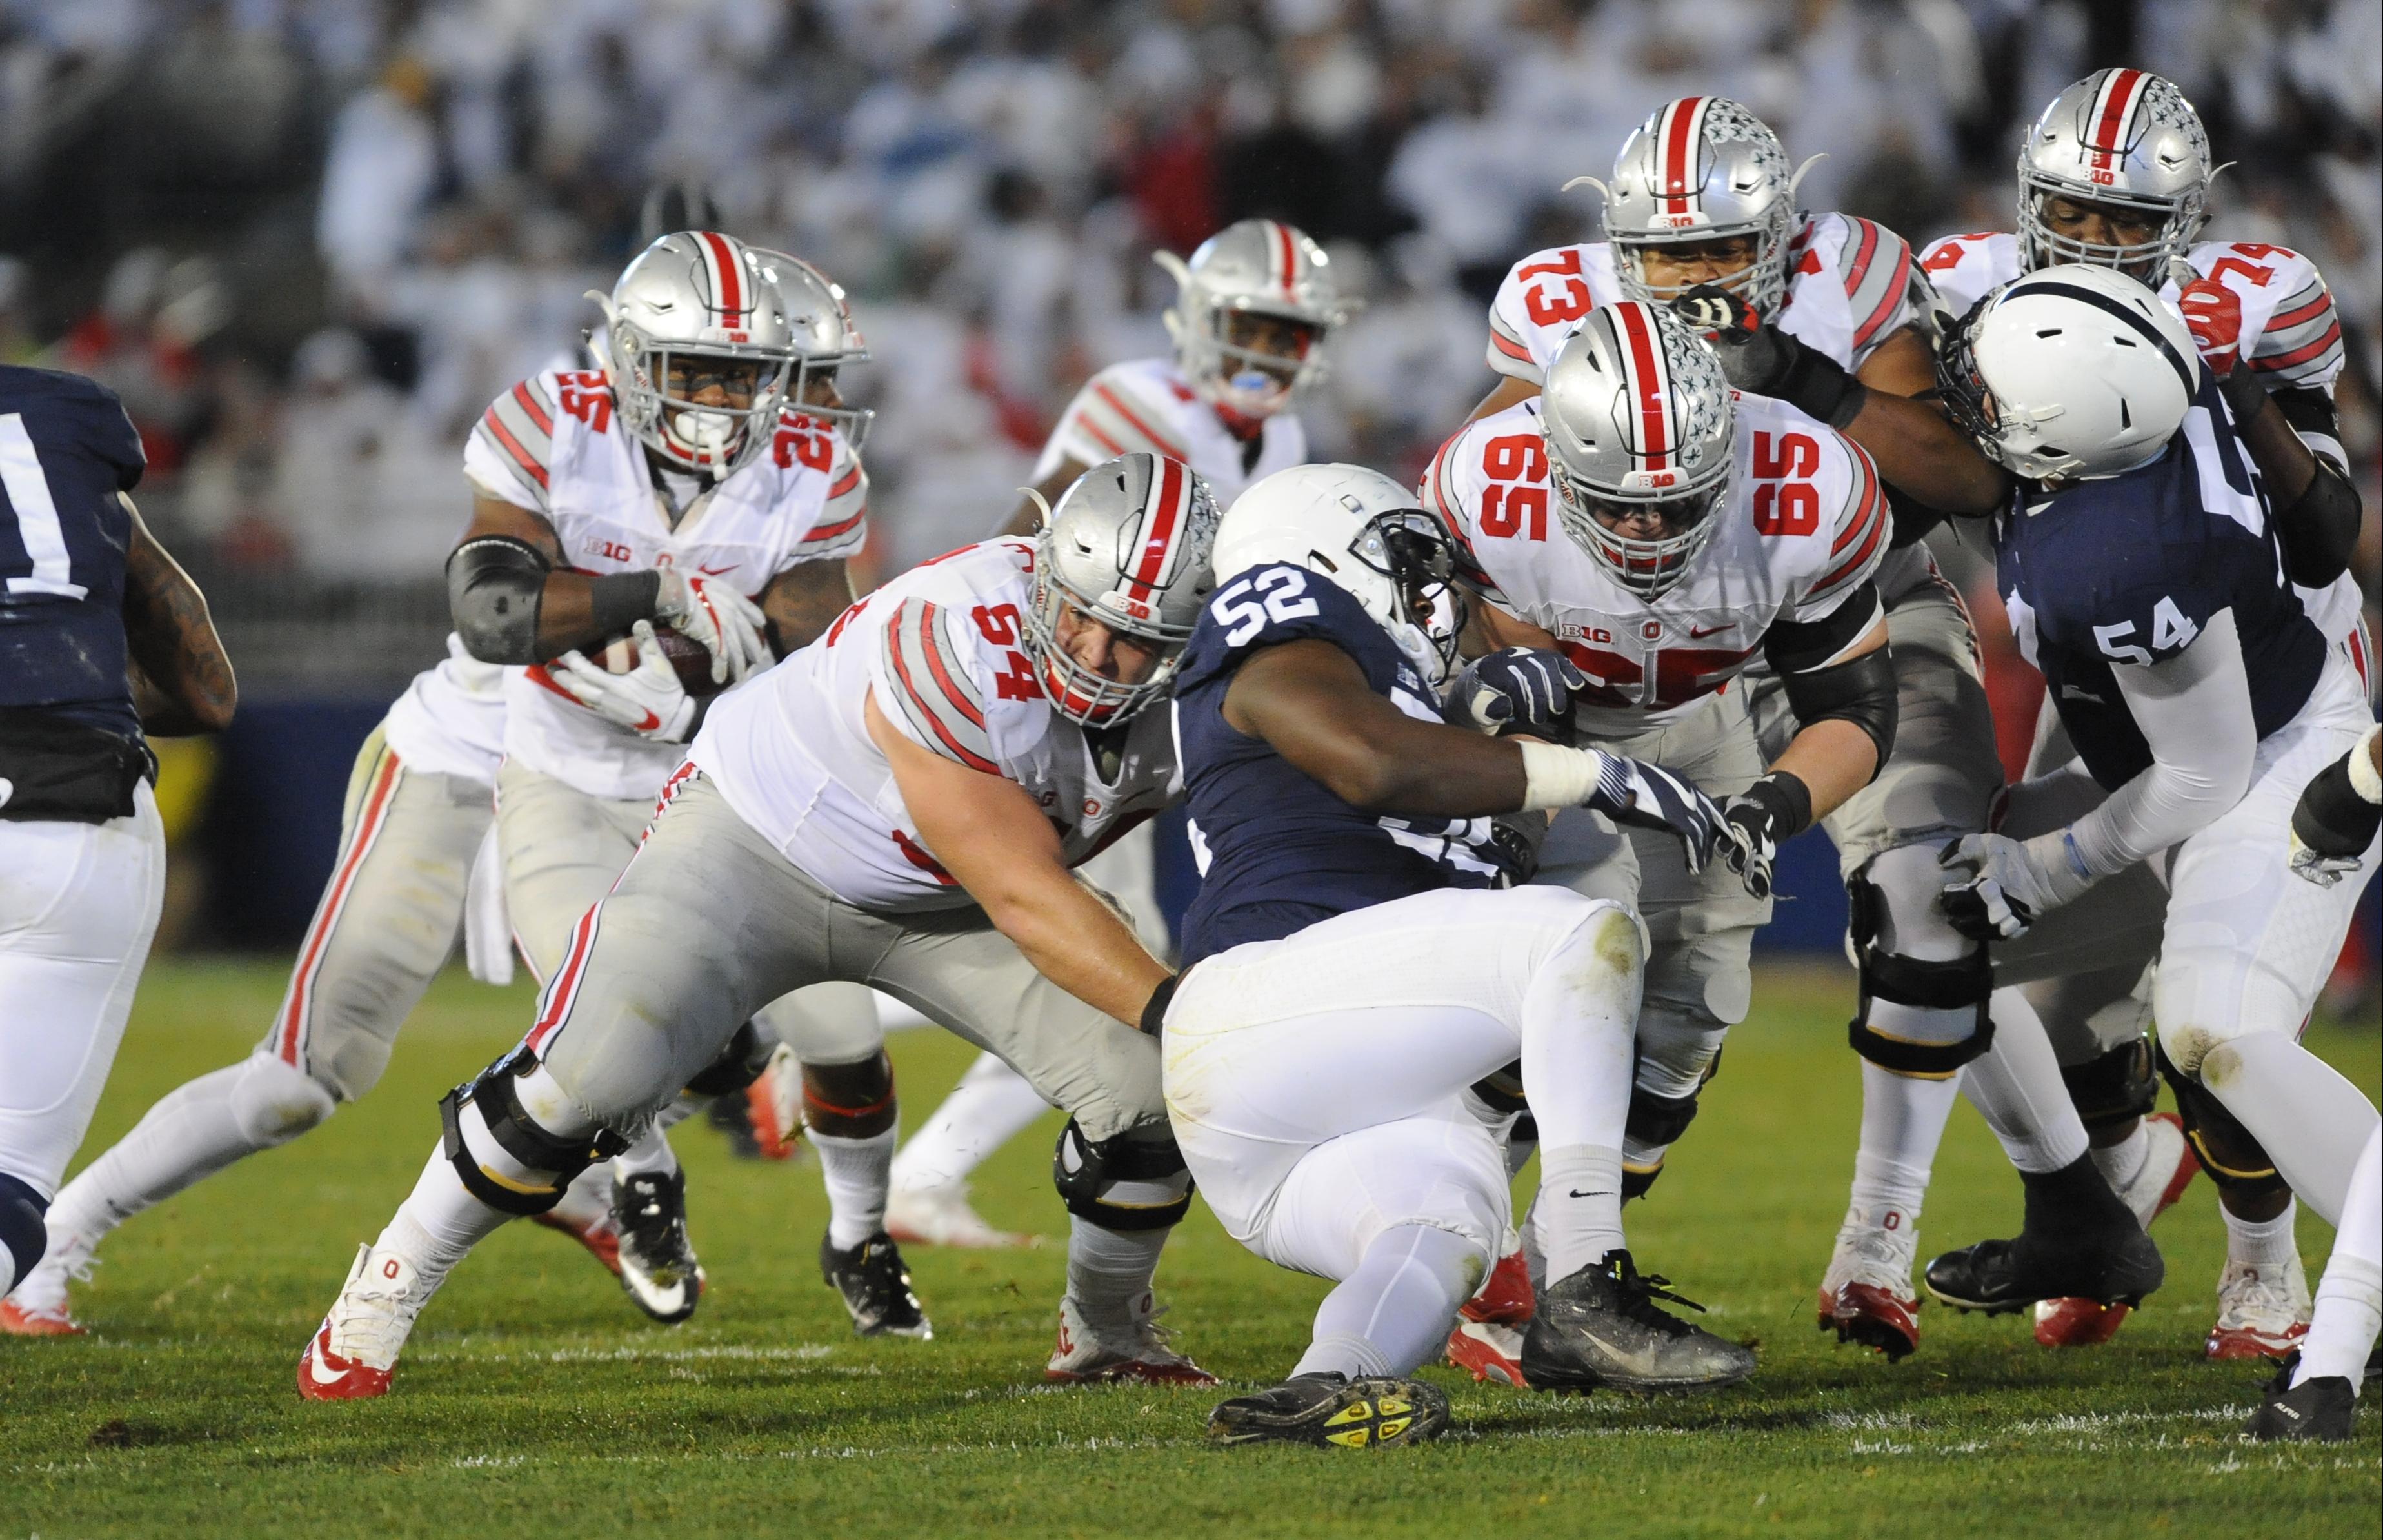 NCAA FOOTBALL: OCT 22 Ohio State at Penn State